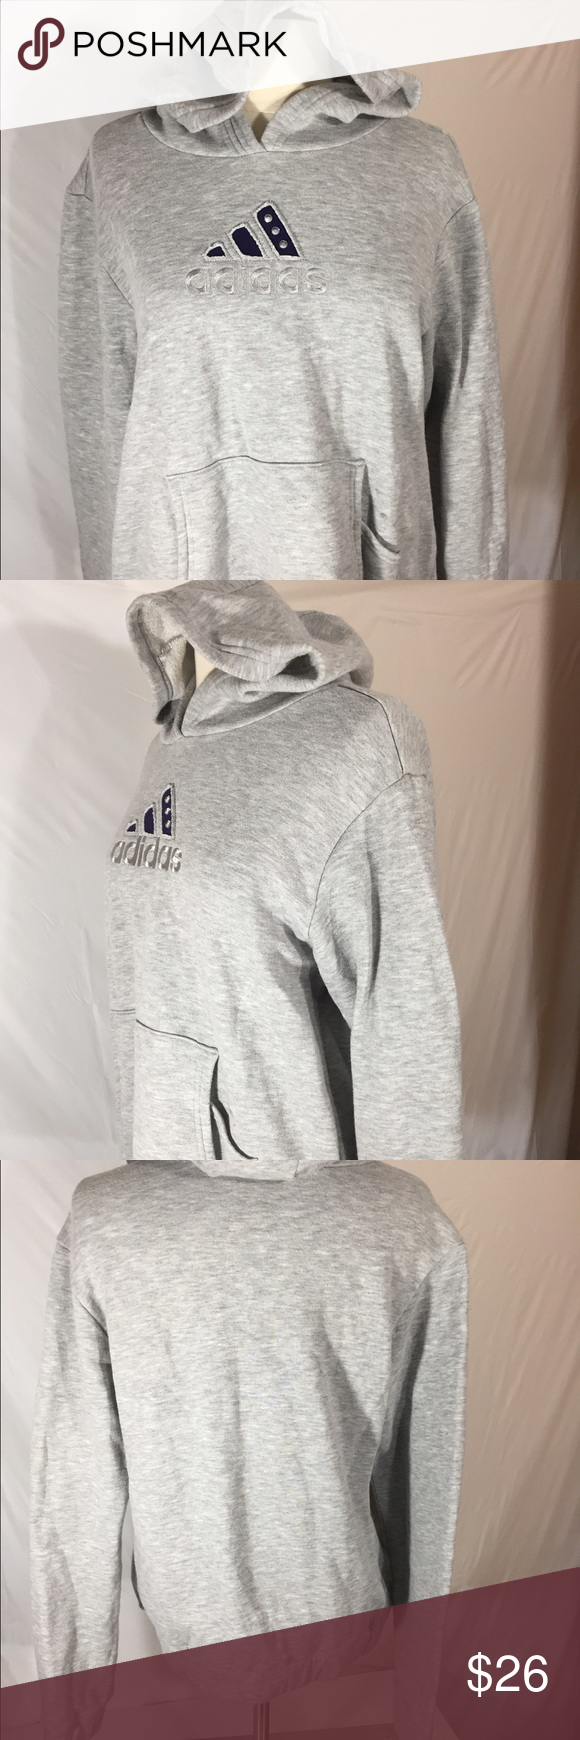 Women's Adidas Hoodie Sz M Excellent condition Adidas Tops Sweatshirts & Hoodies